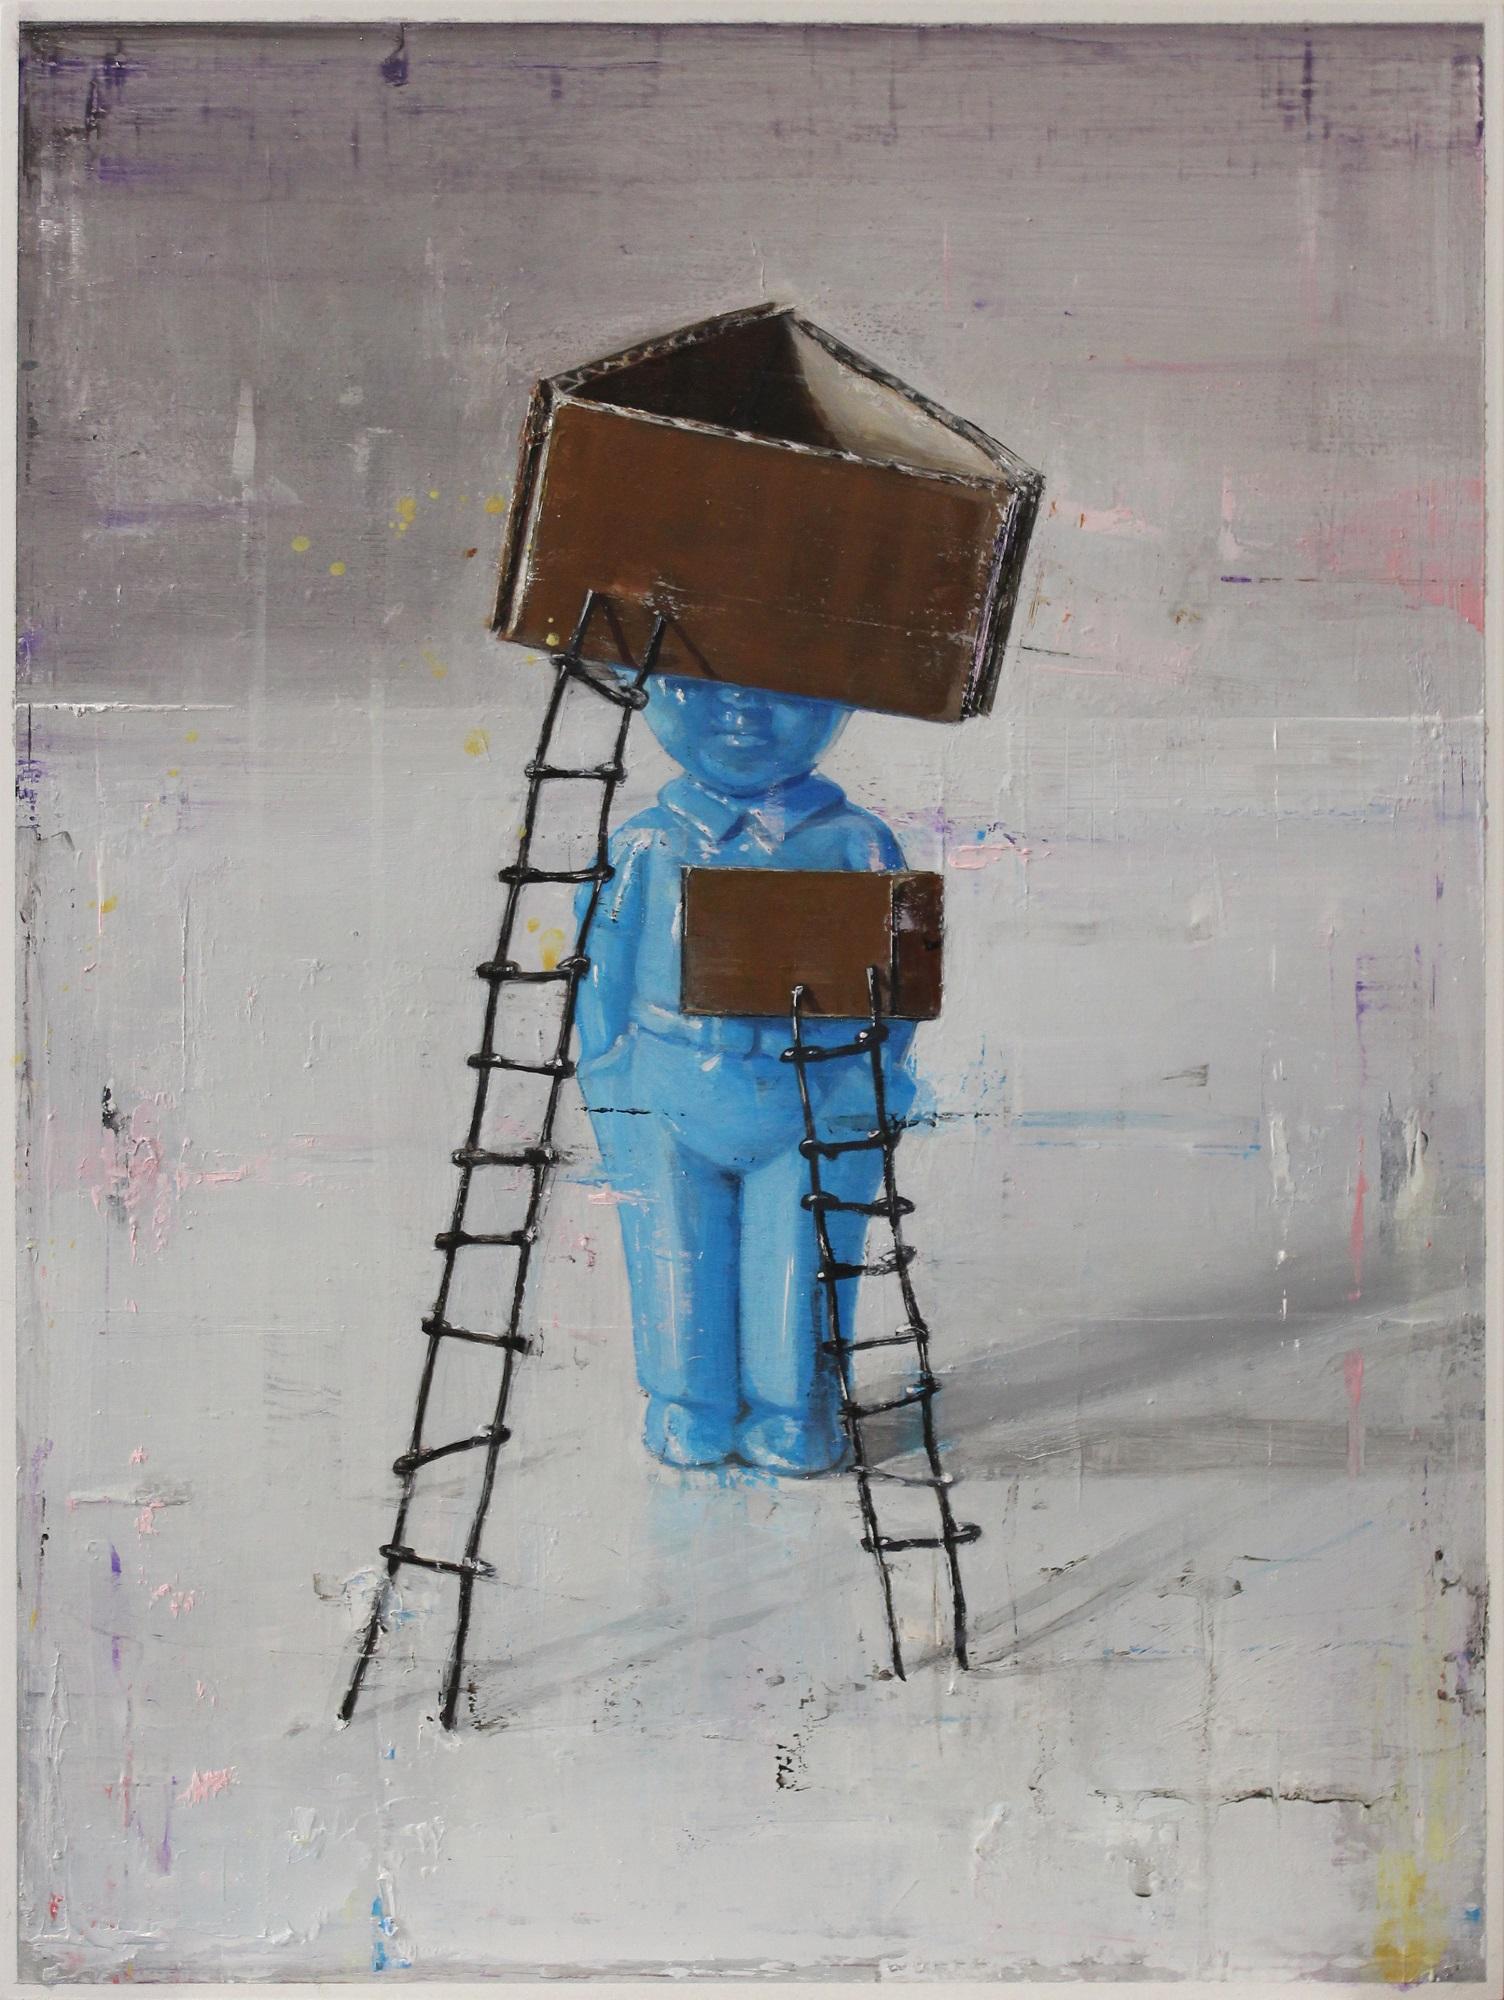 Yohei Yashima, Wallman, 2018, 40 × 30 cm